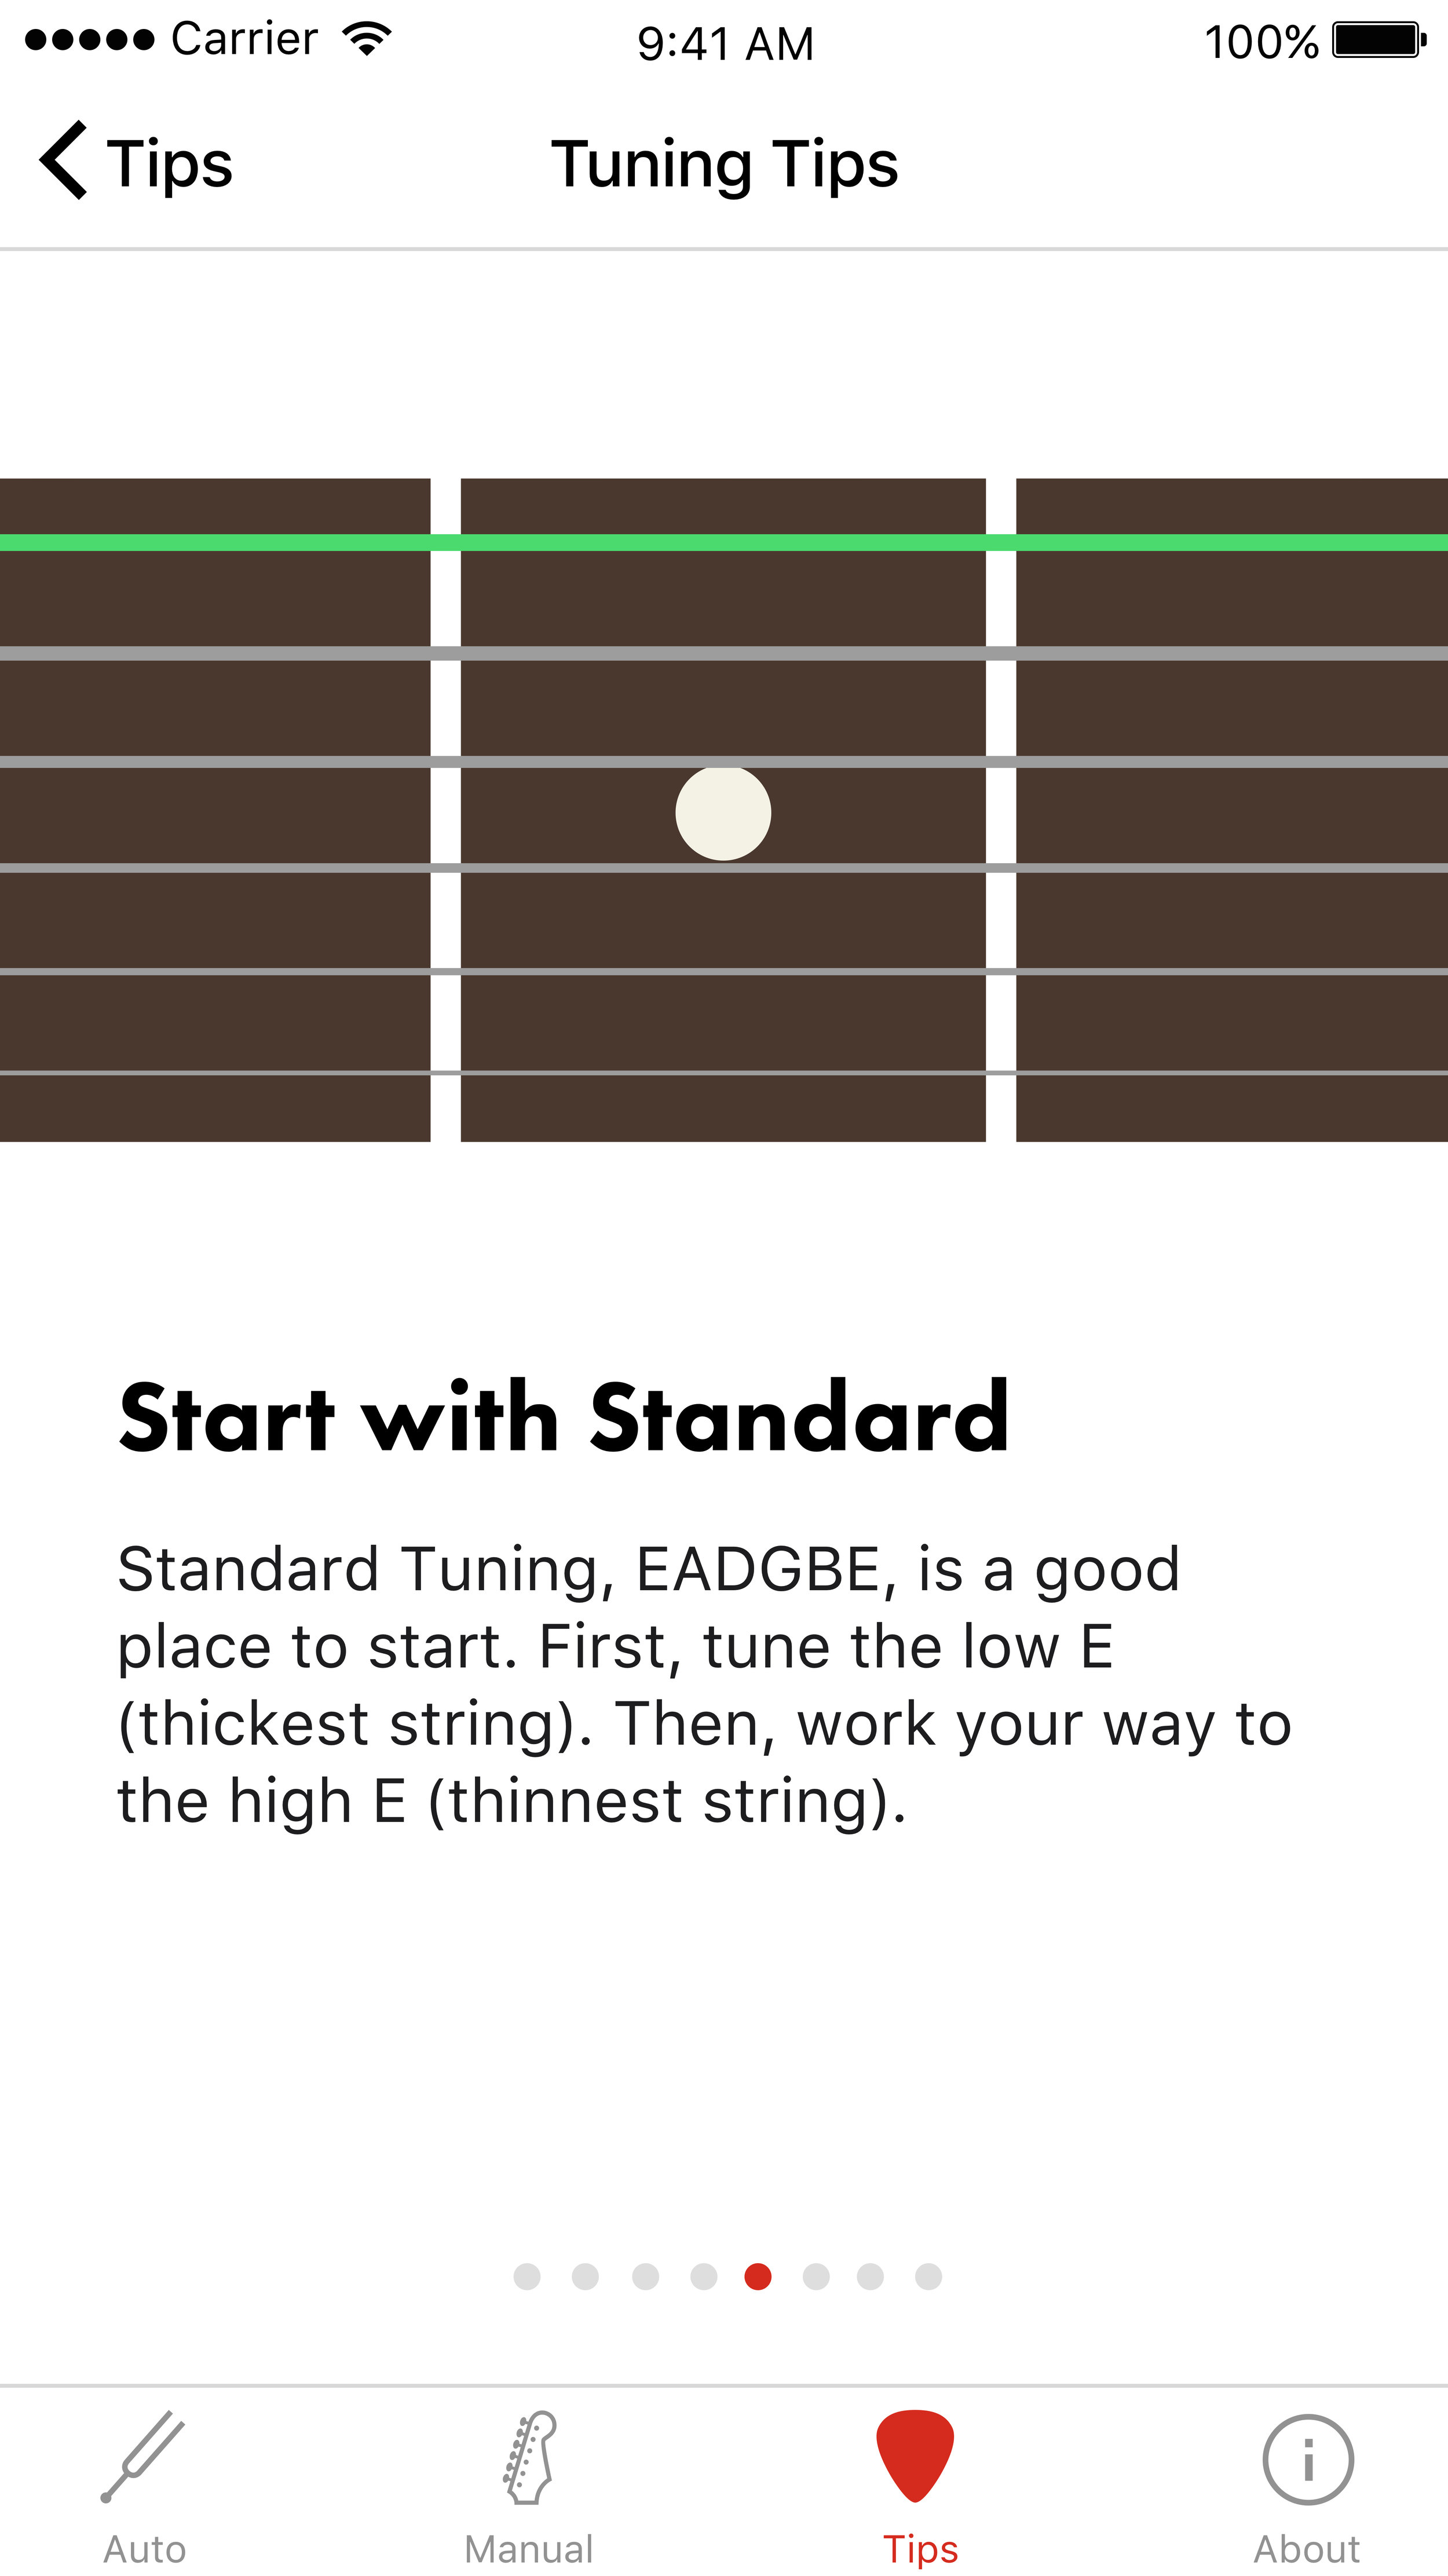 tuning-tips-start-standard.jpg